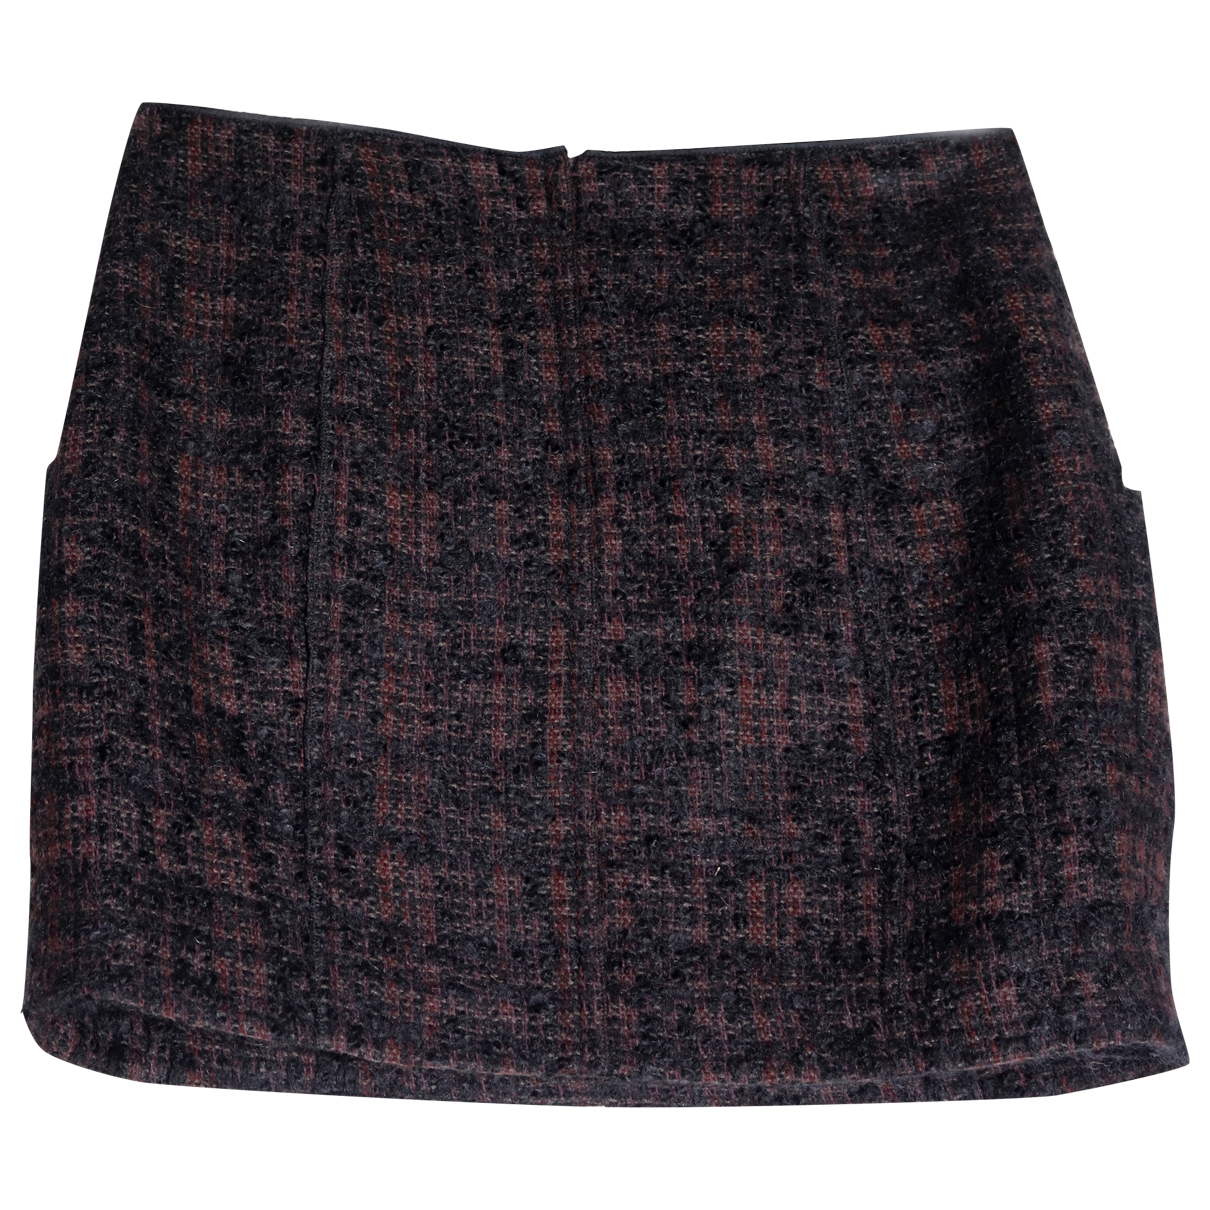 Prada \N Burgundy Wool skirt for Women 42 IT